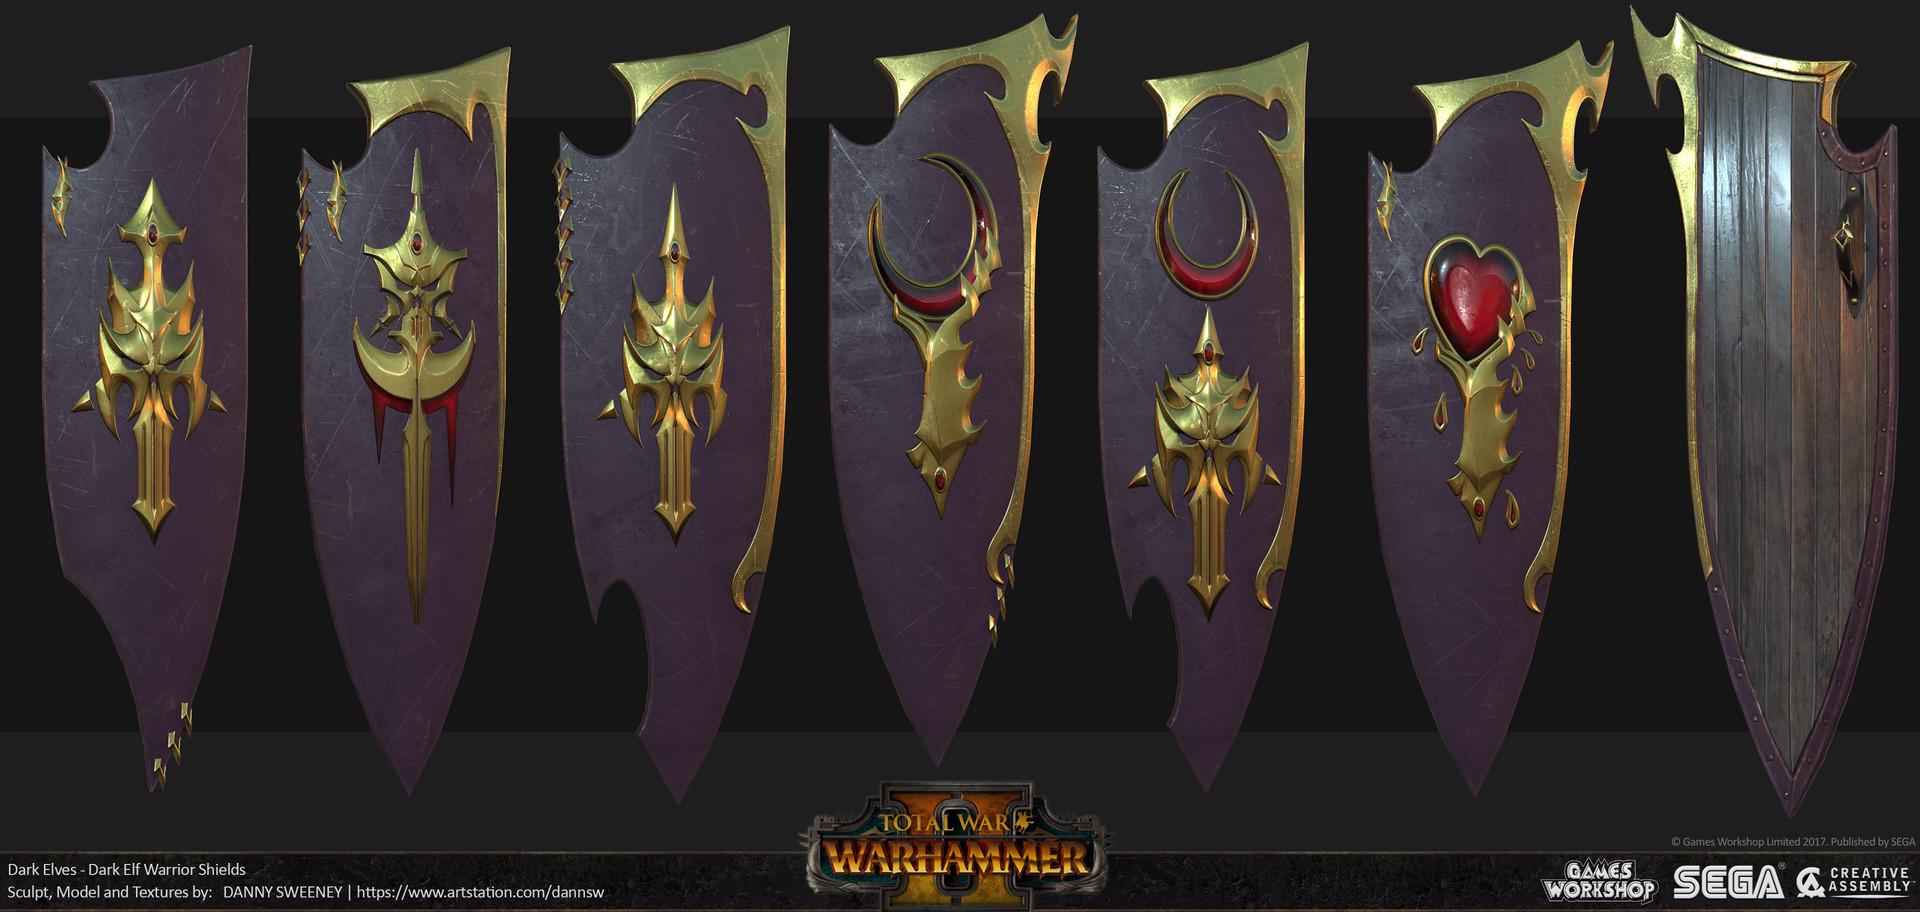 danny-sweeney-dannys-def-warrior-shields-01.jpg